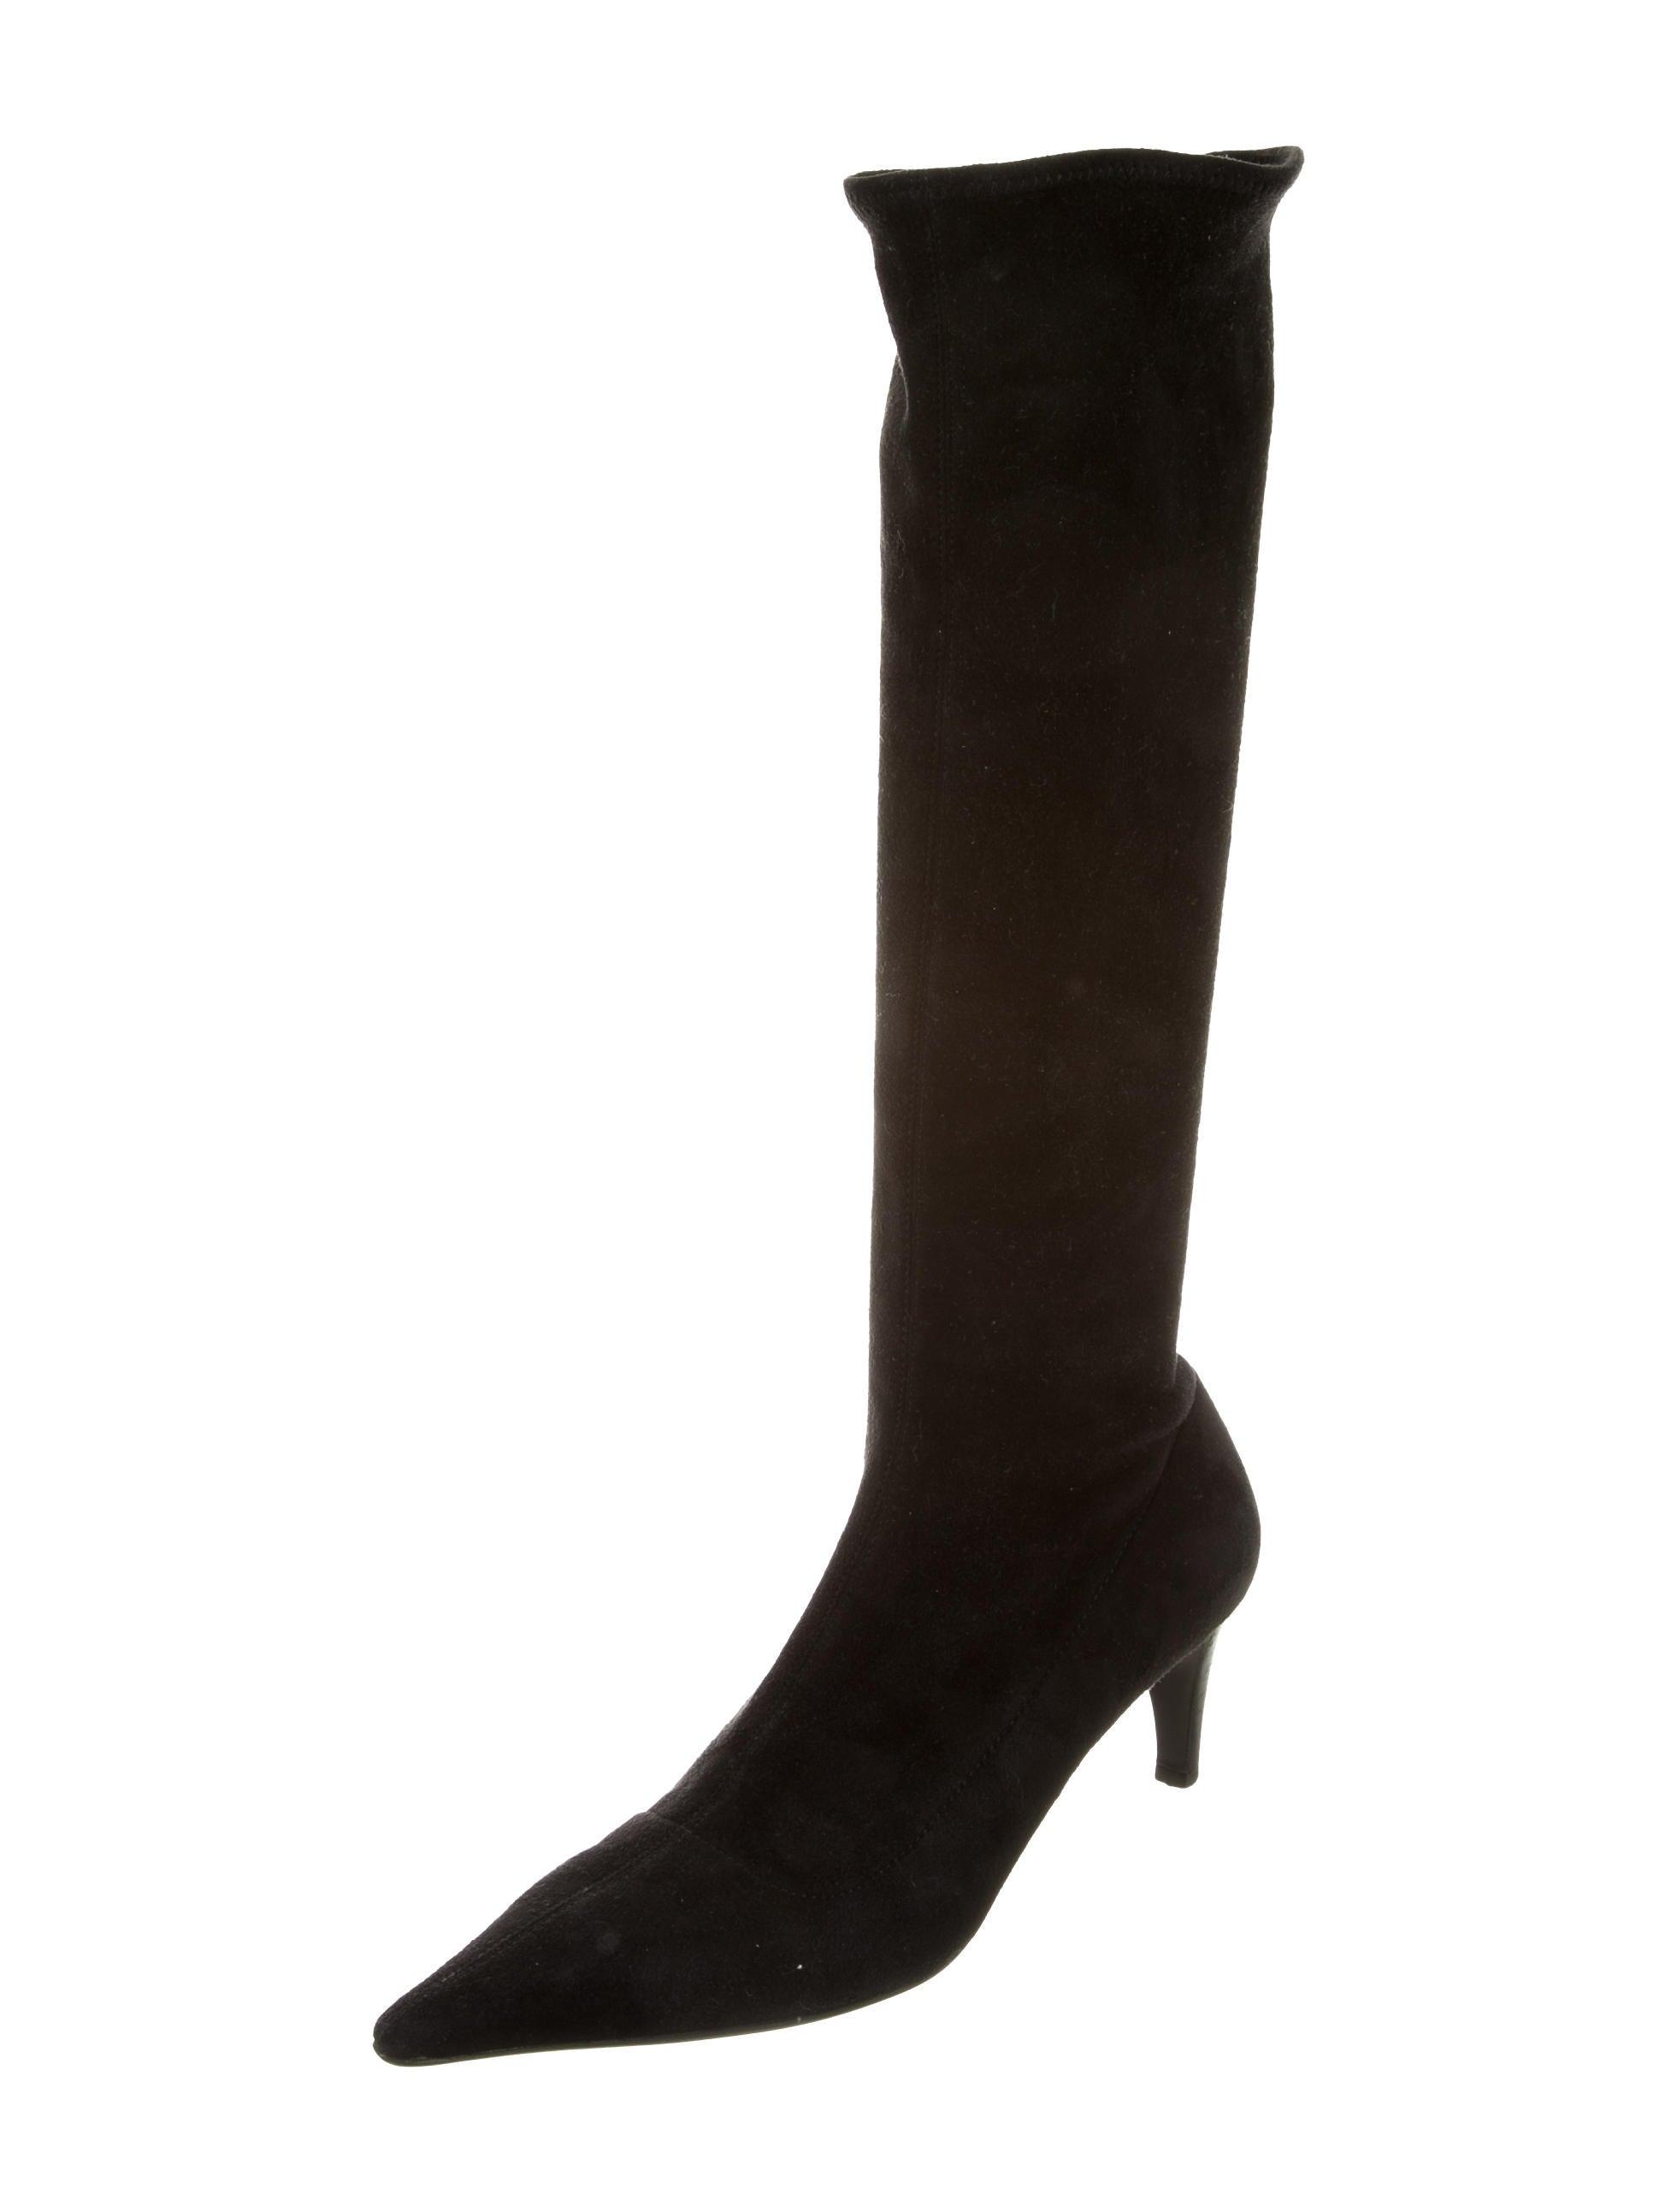 prada suede knee high boots shoes pra134939 the realreal